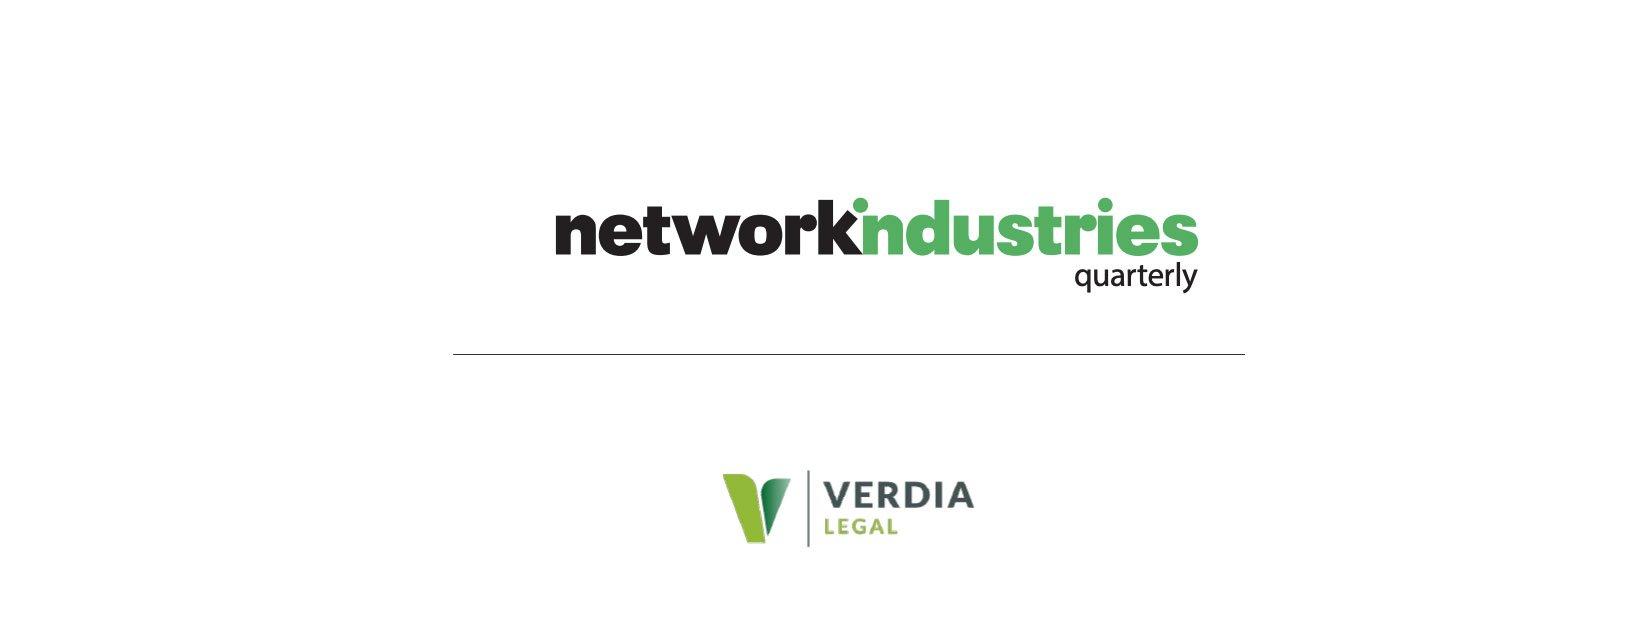 Network Industries Quarterly